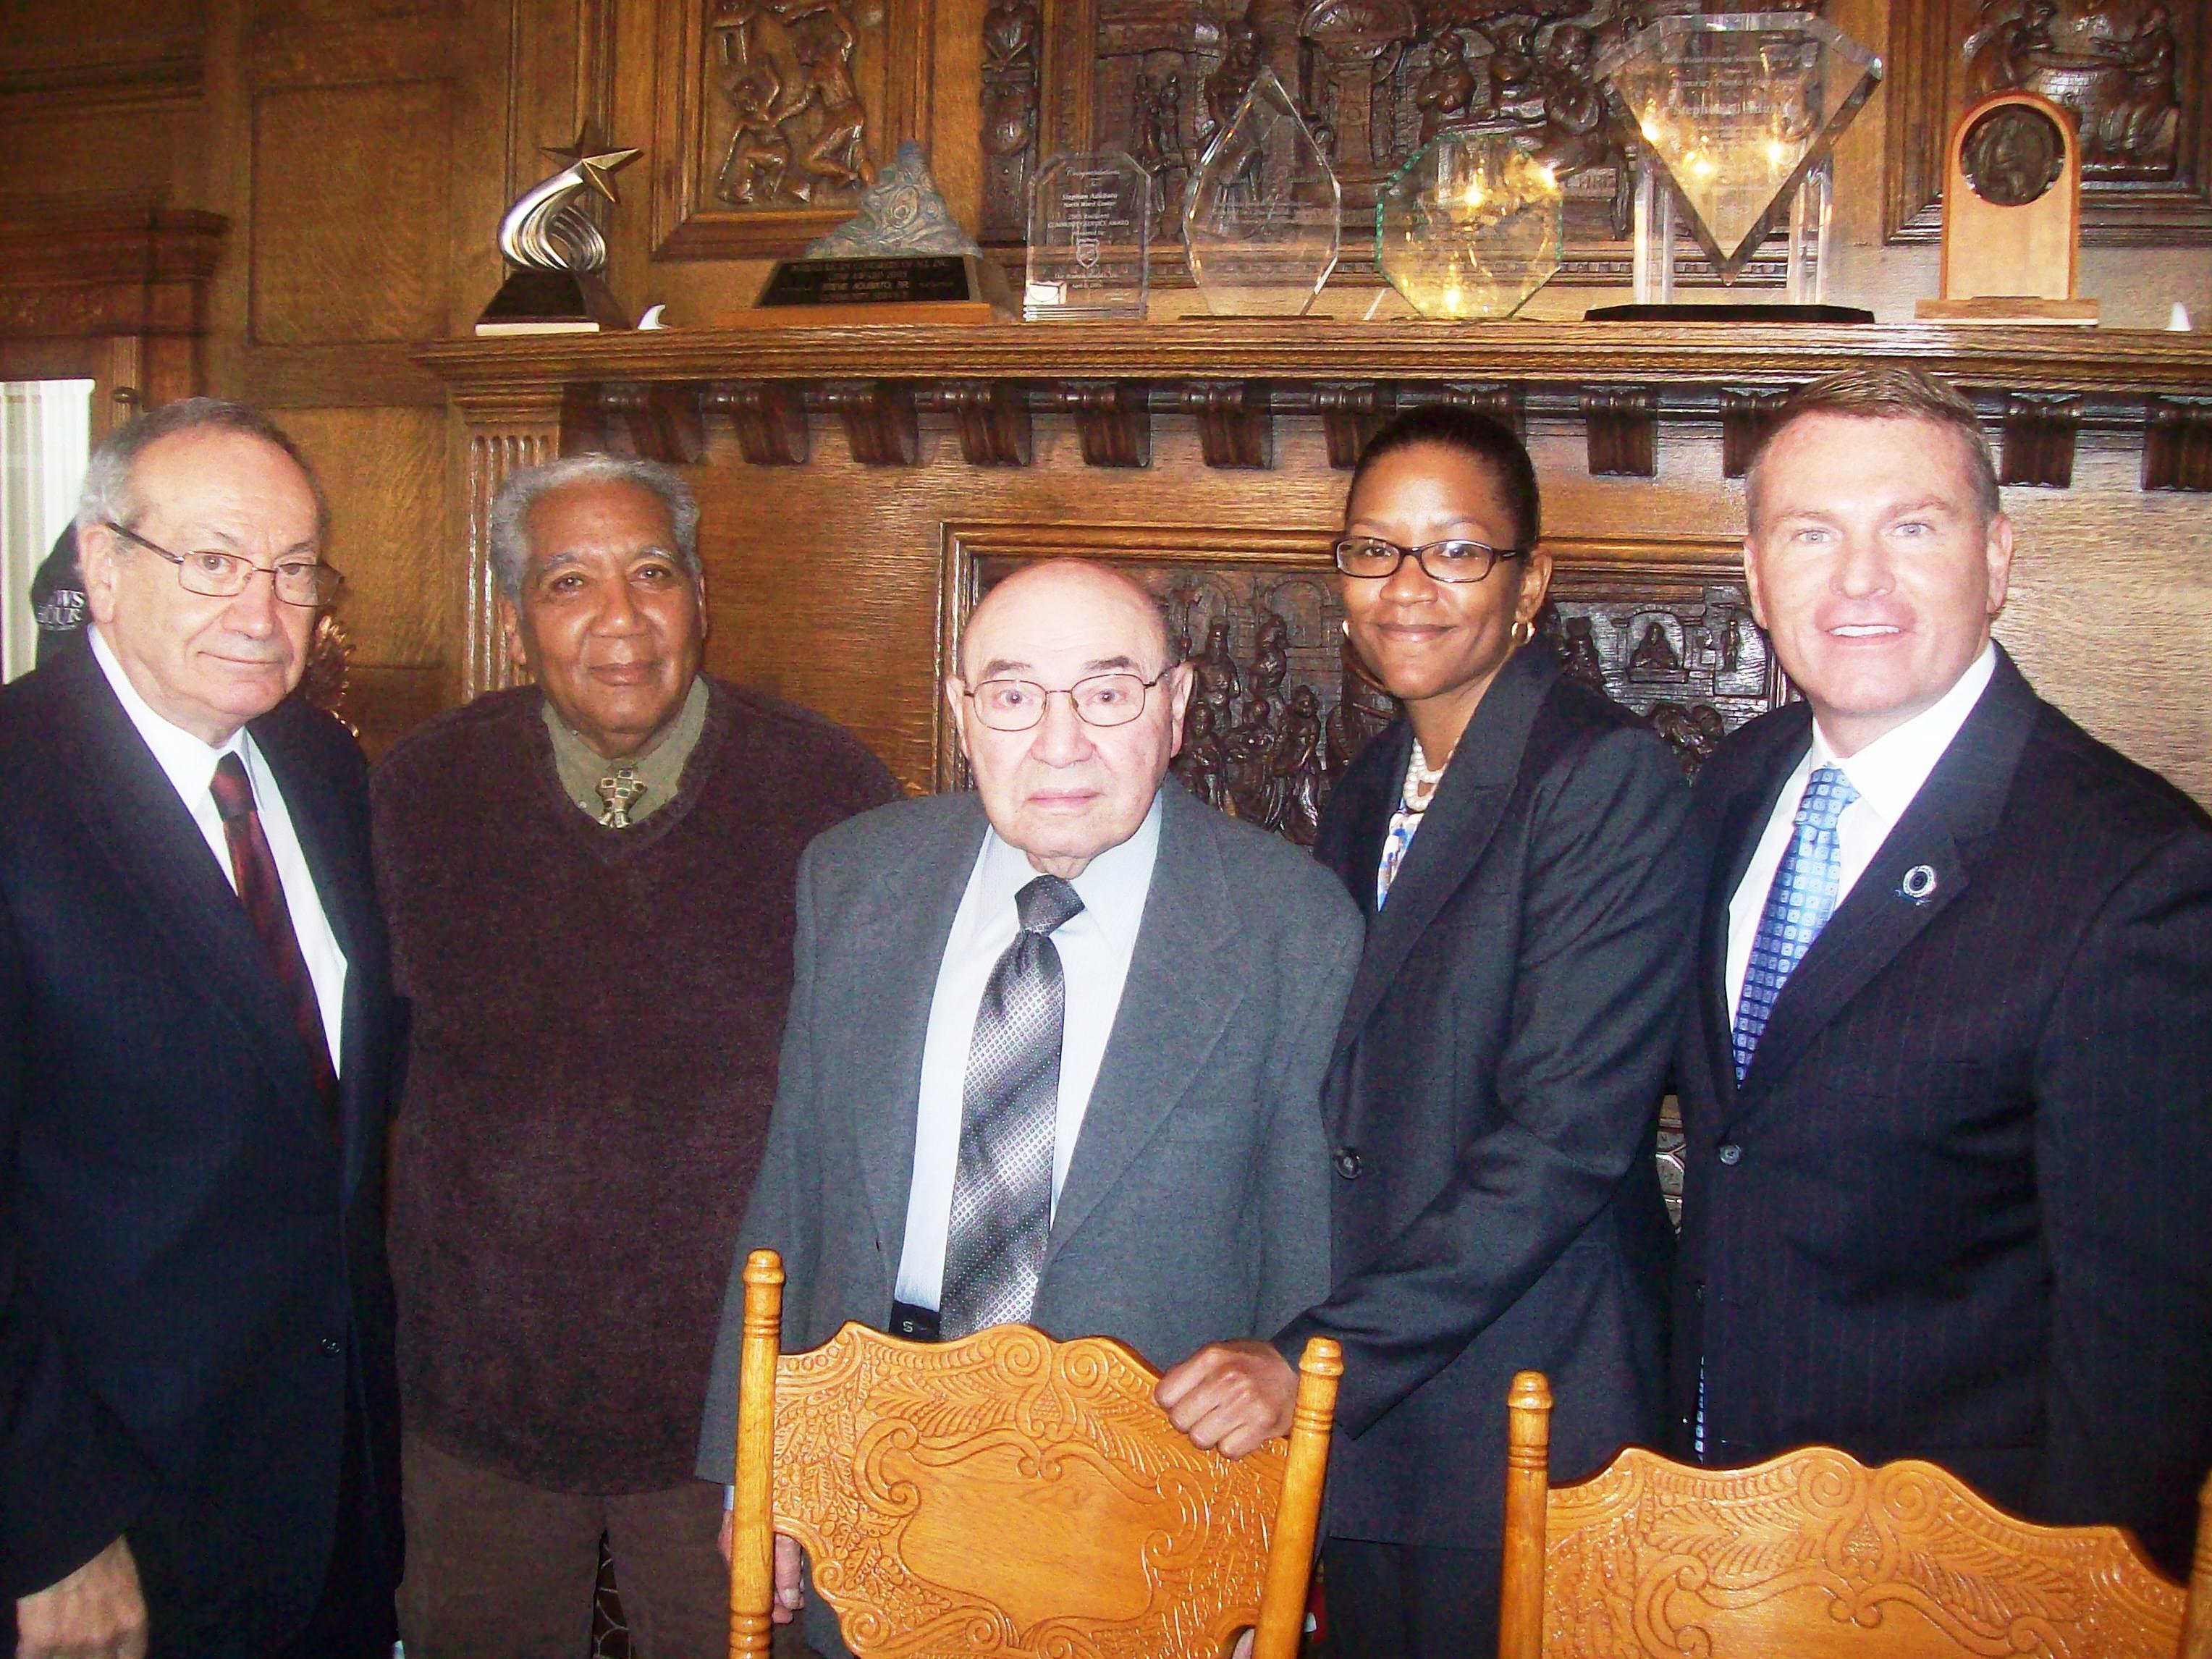 Left to right: Steve Adubato, Sr., George Richardson, Robert Sarcone, Assemblywoman Grace Spencer (D-Newark), and Essex County Clerk Christopher Durkin